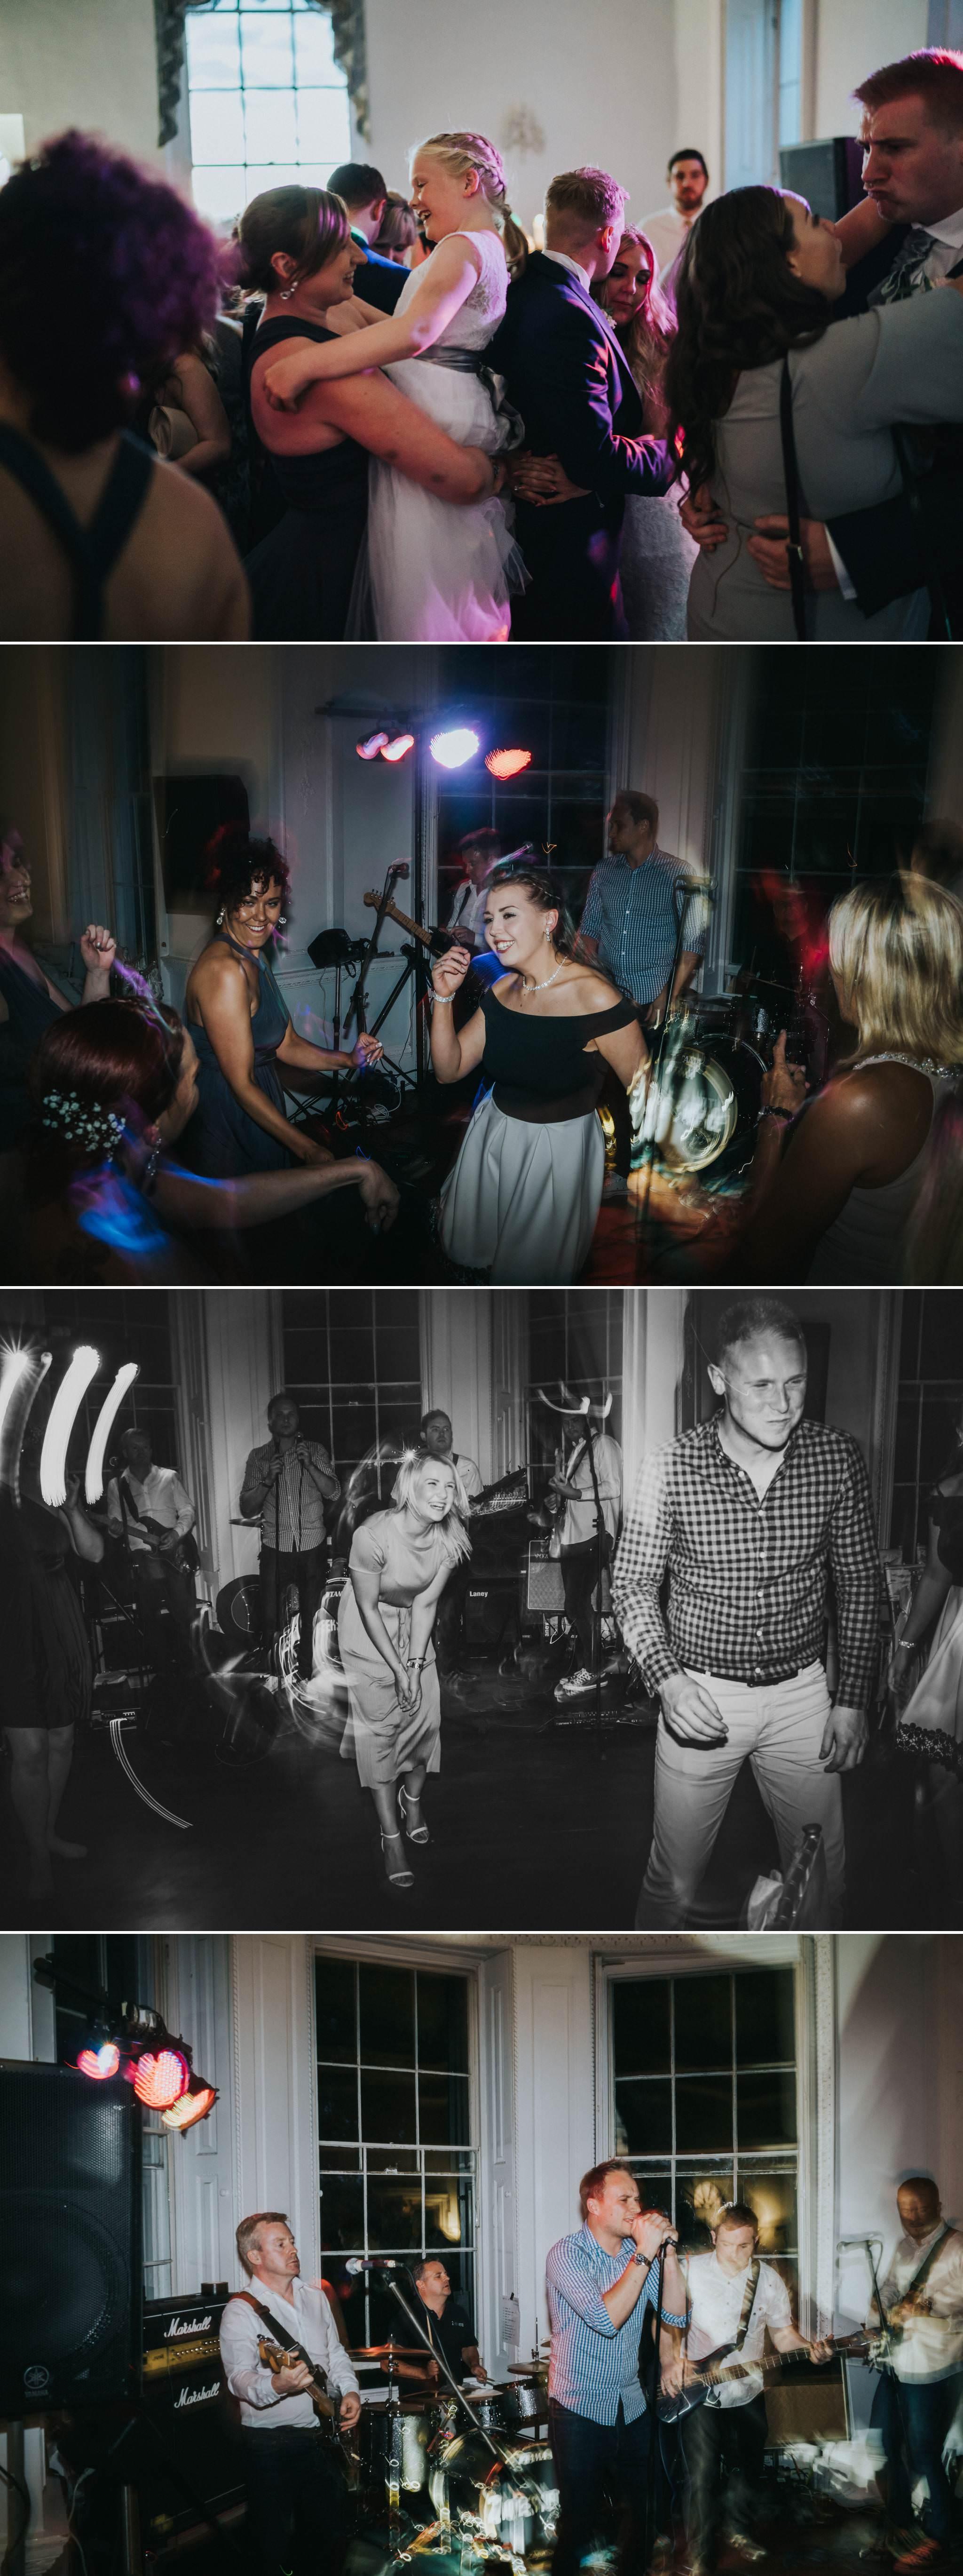 somerford-hall-wedding-photography 23.jpg